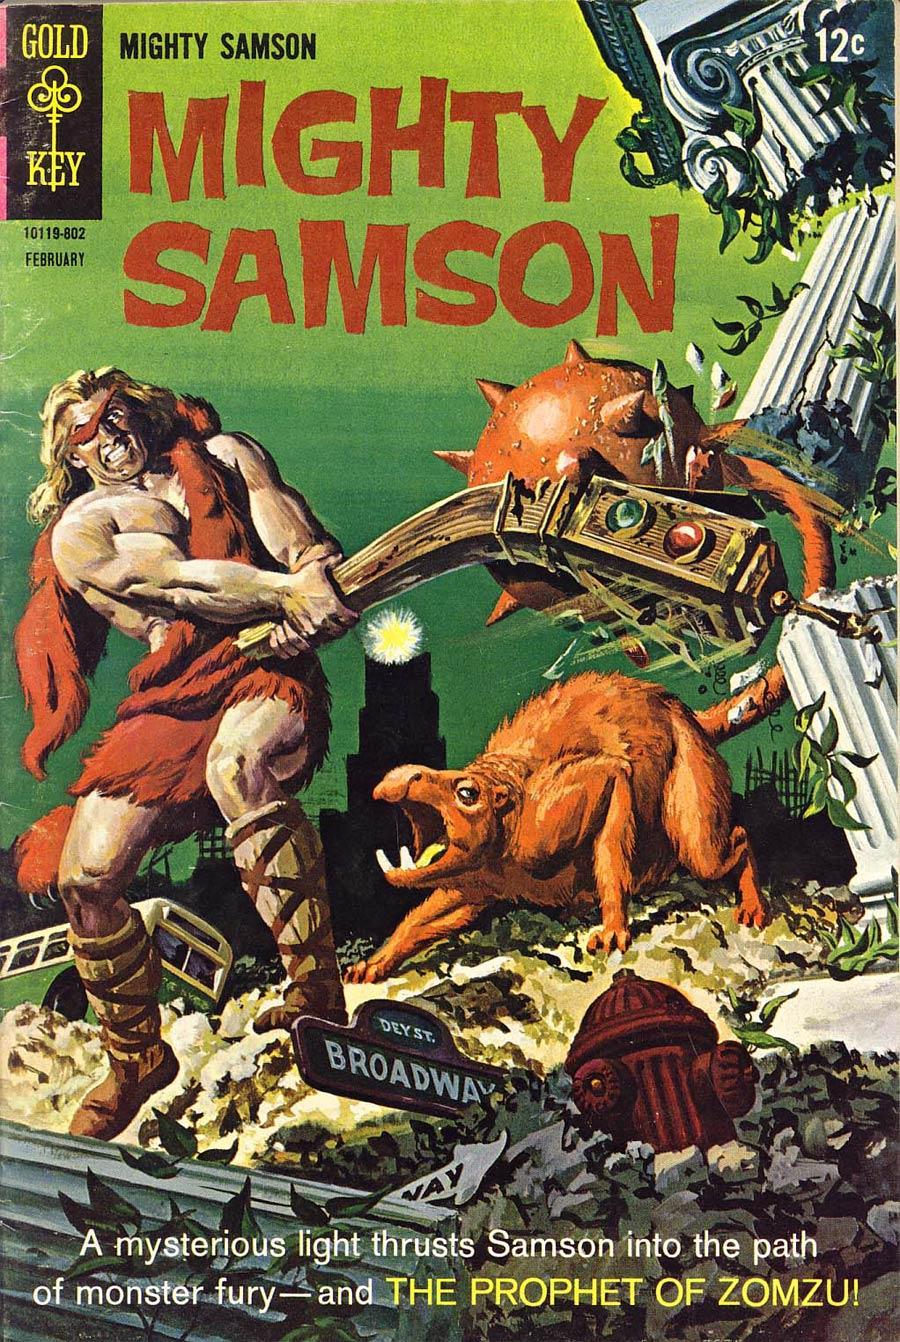 Mighty Samson #13